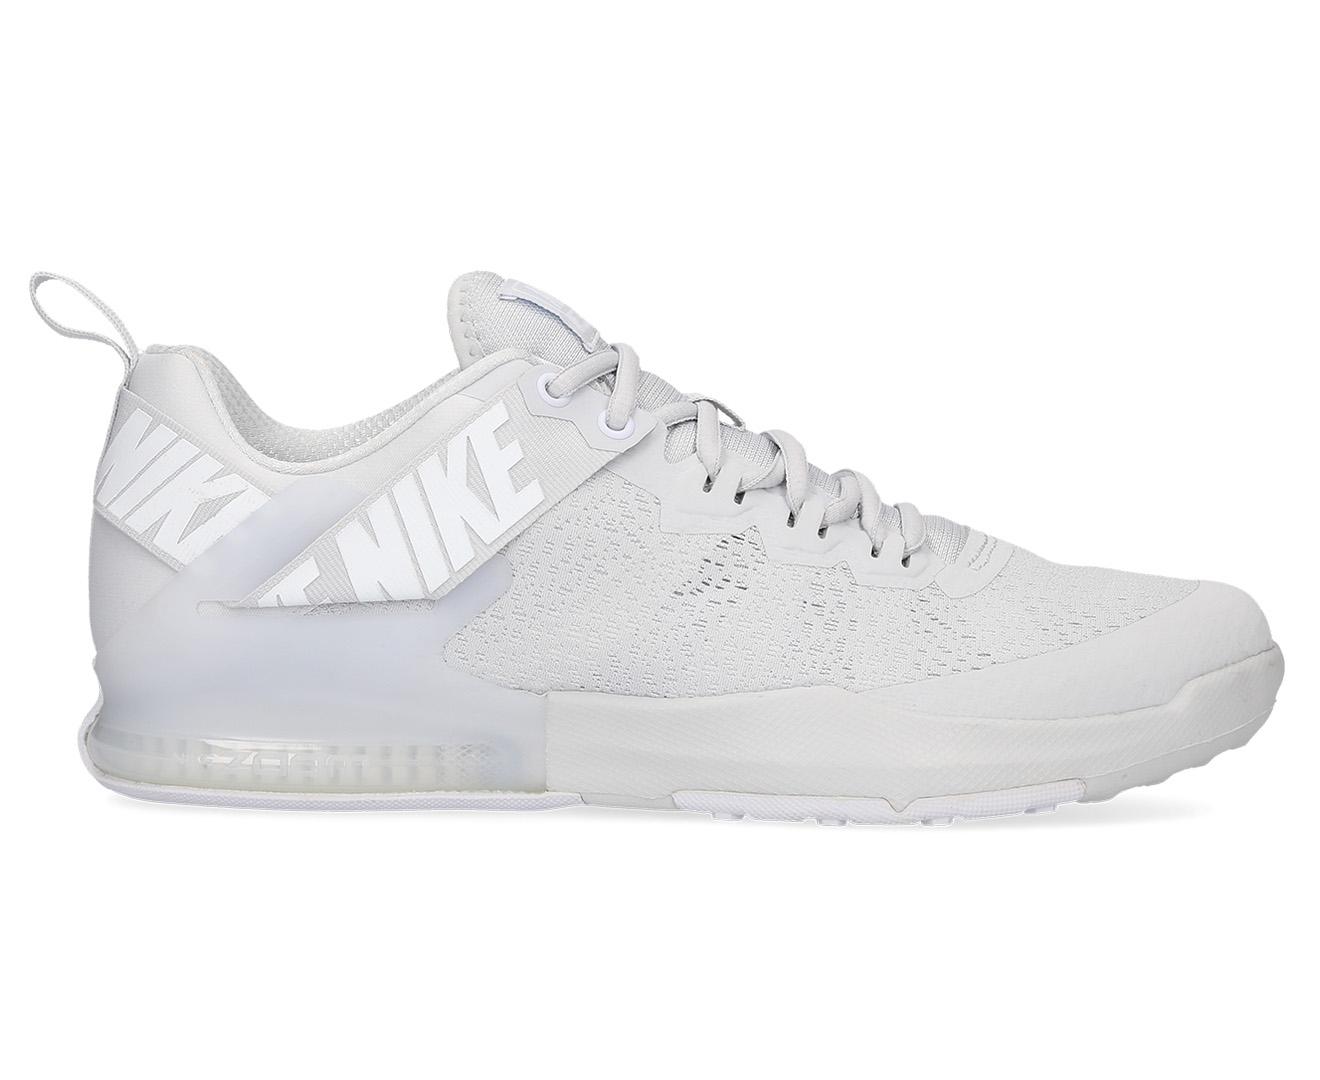 8c8e84877213 Nike Men s Zoom Domination TR 2 Shoe - Pure Platinum White